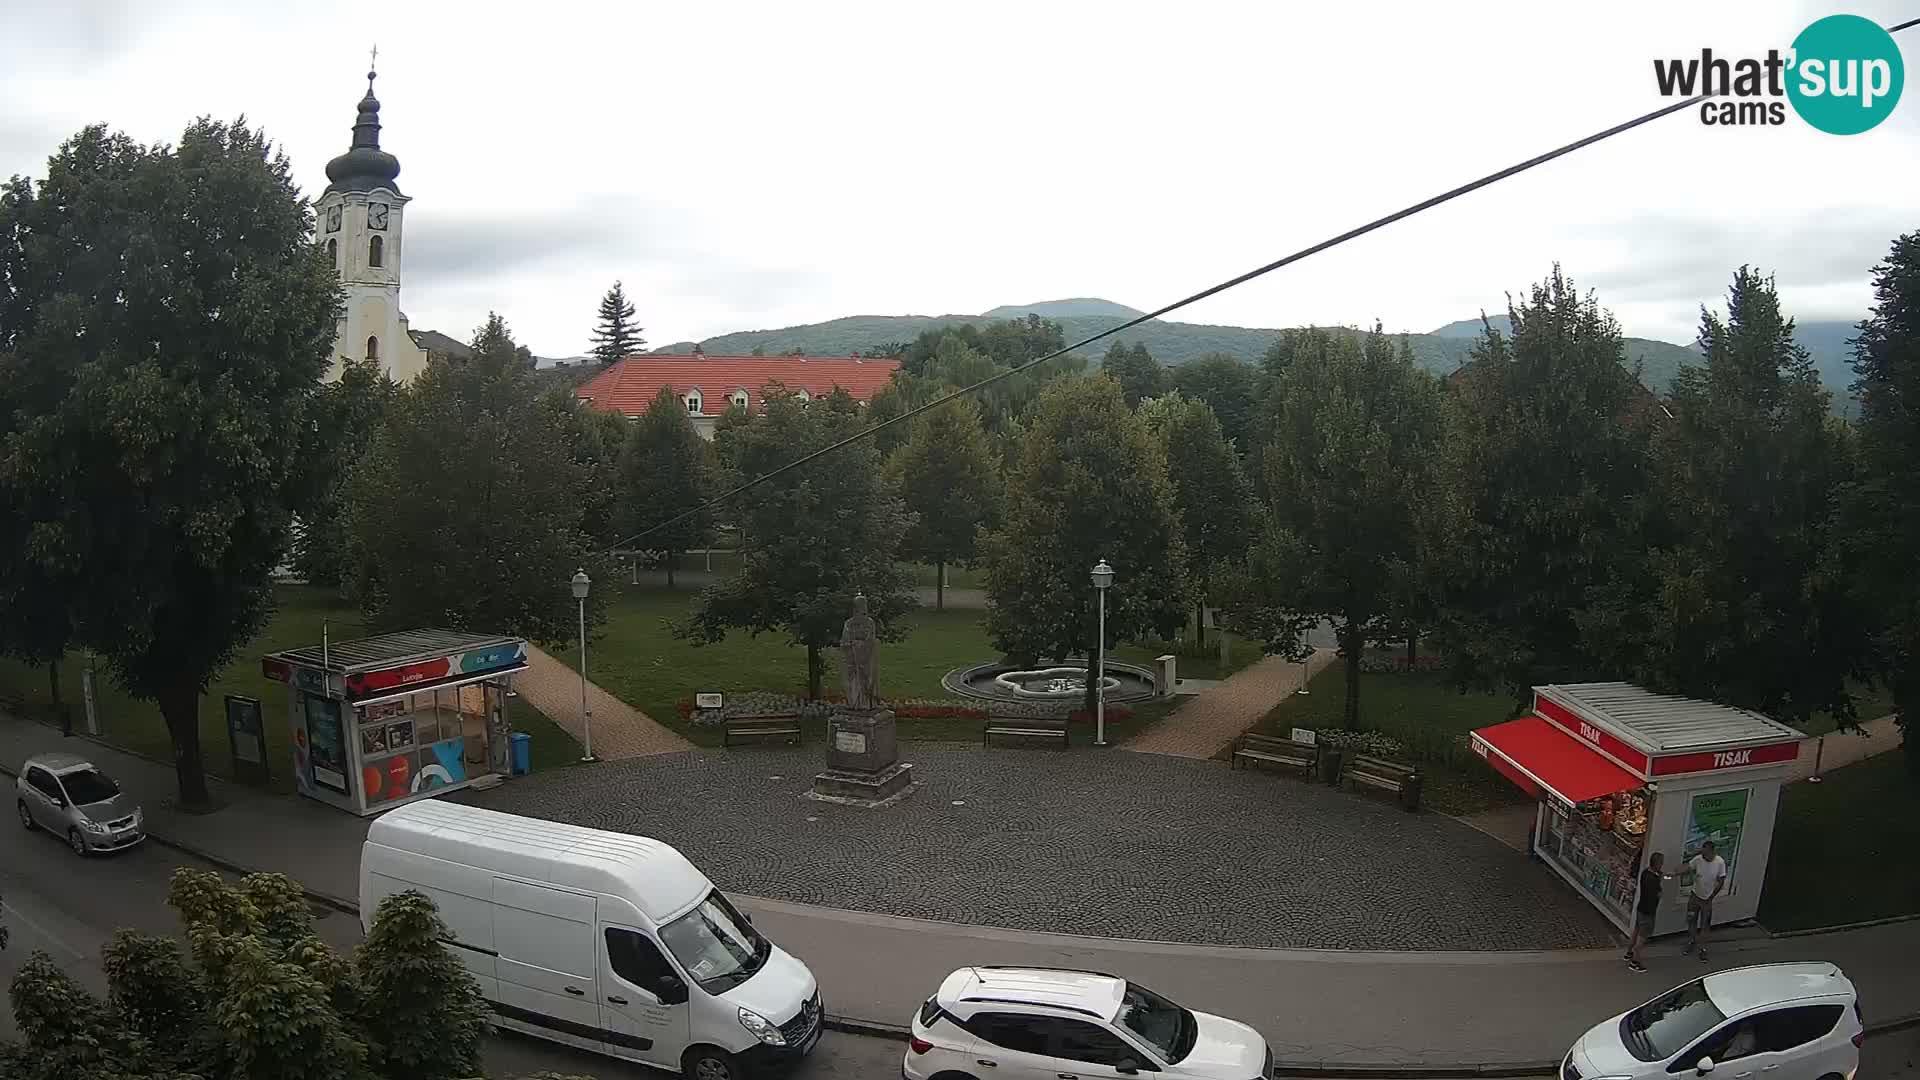 Ogulin Livecam